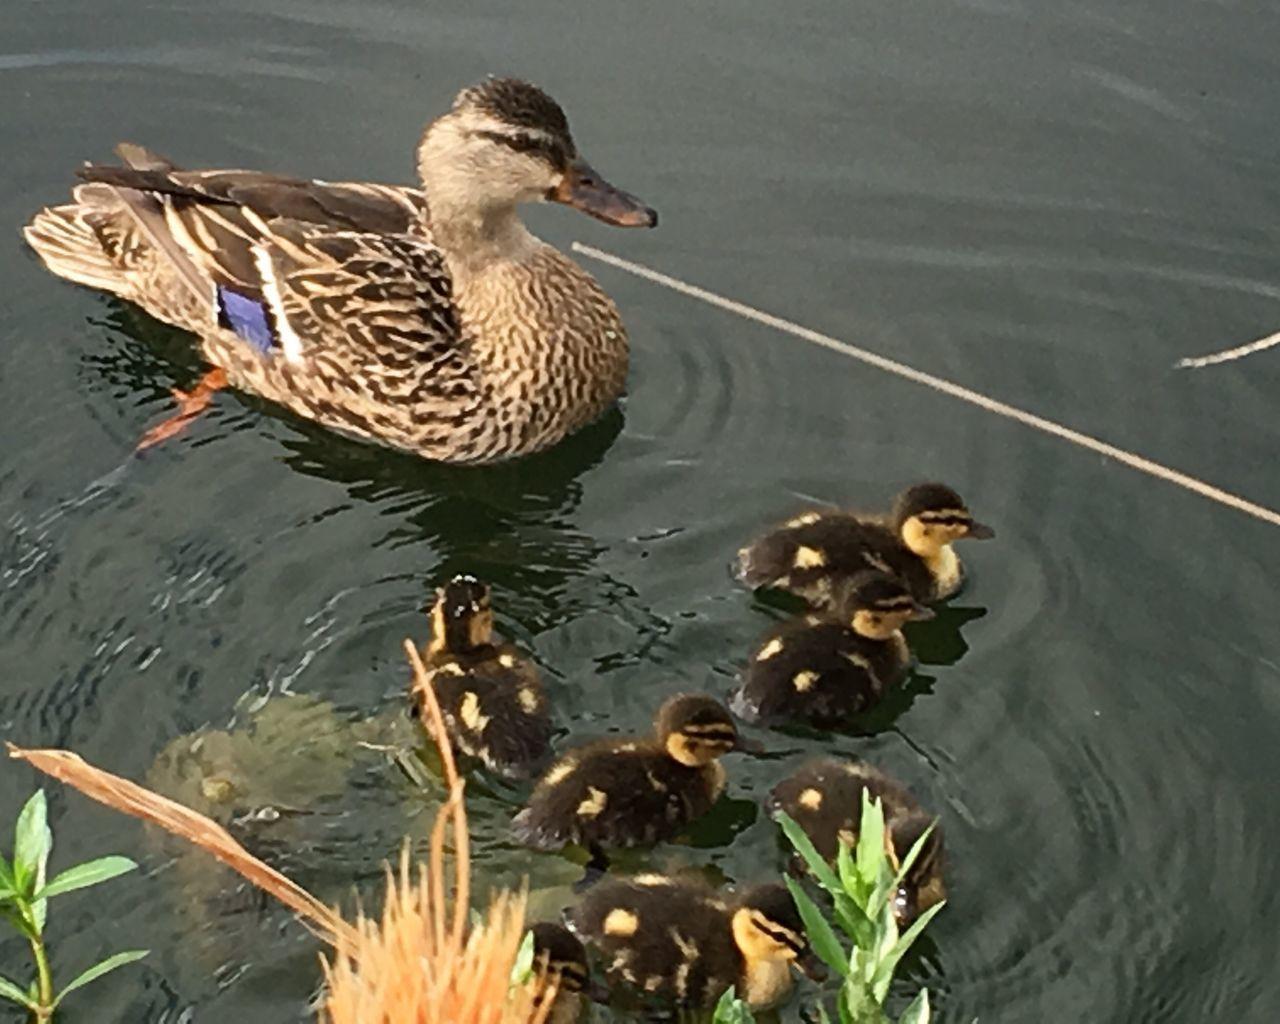 Mother Duck Ducklings Mallard Ducks Baby Ducks Water Lake Duck Waterfront Swimming Waterfowl Adorable Cute